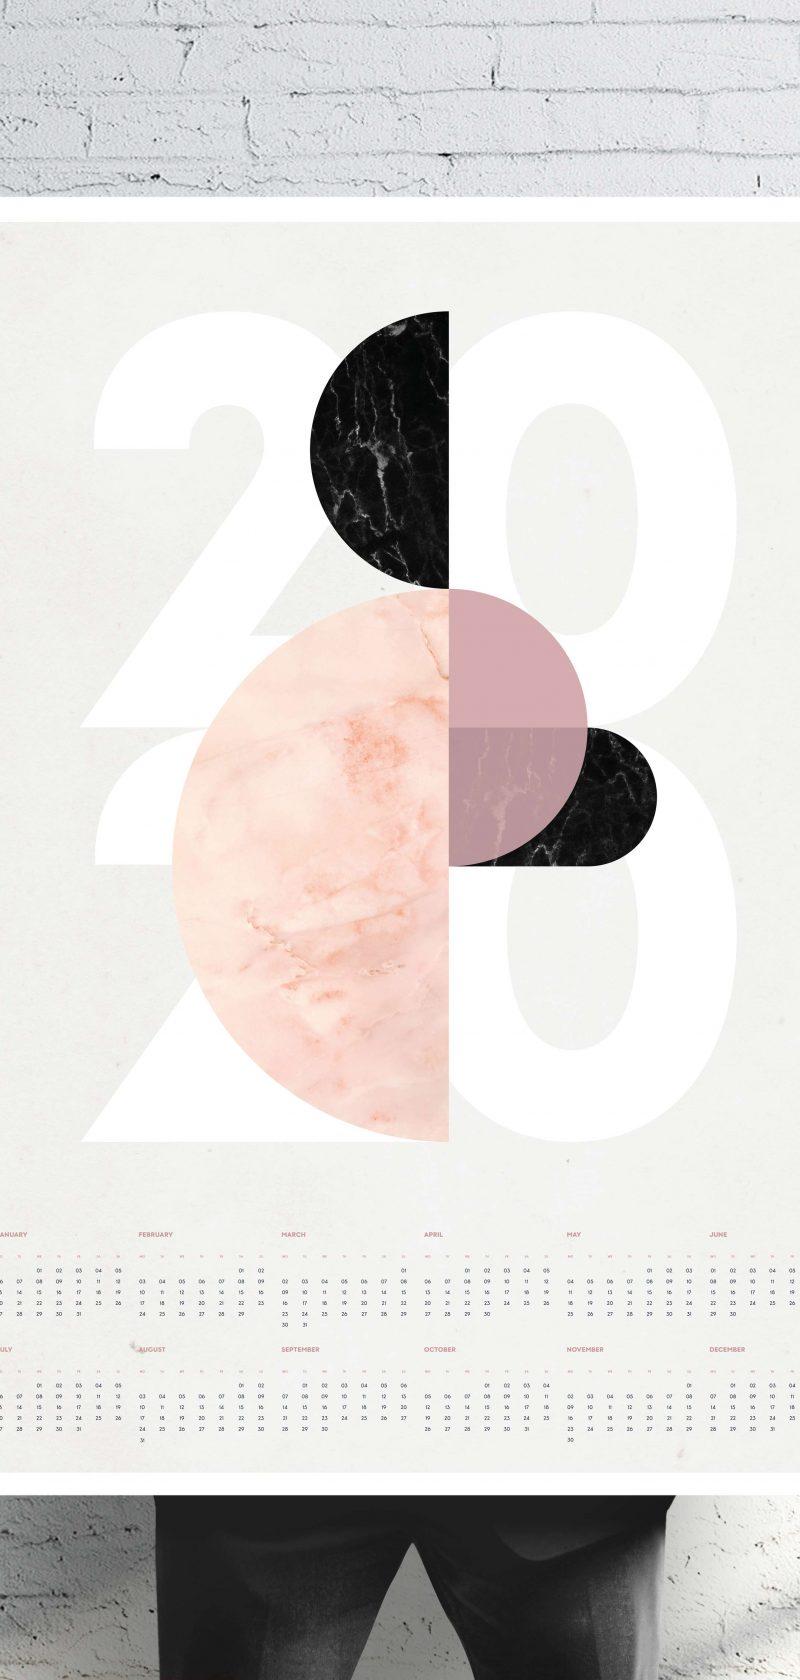 Marble Mania Wall Calendar 2020